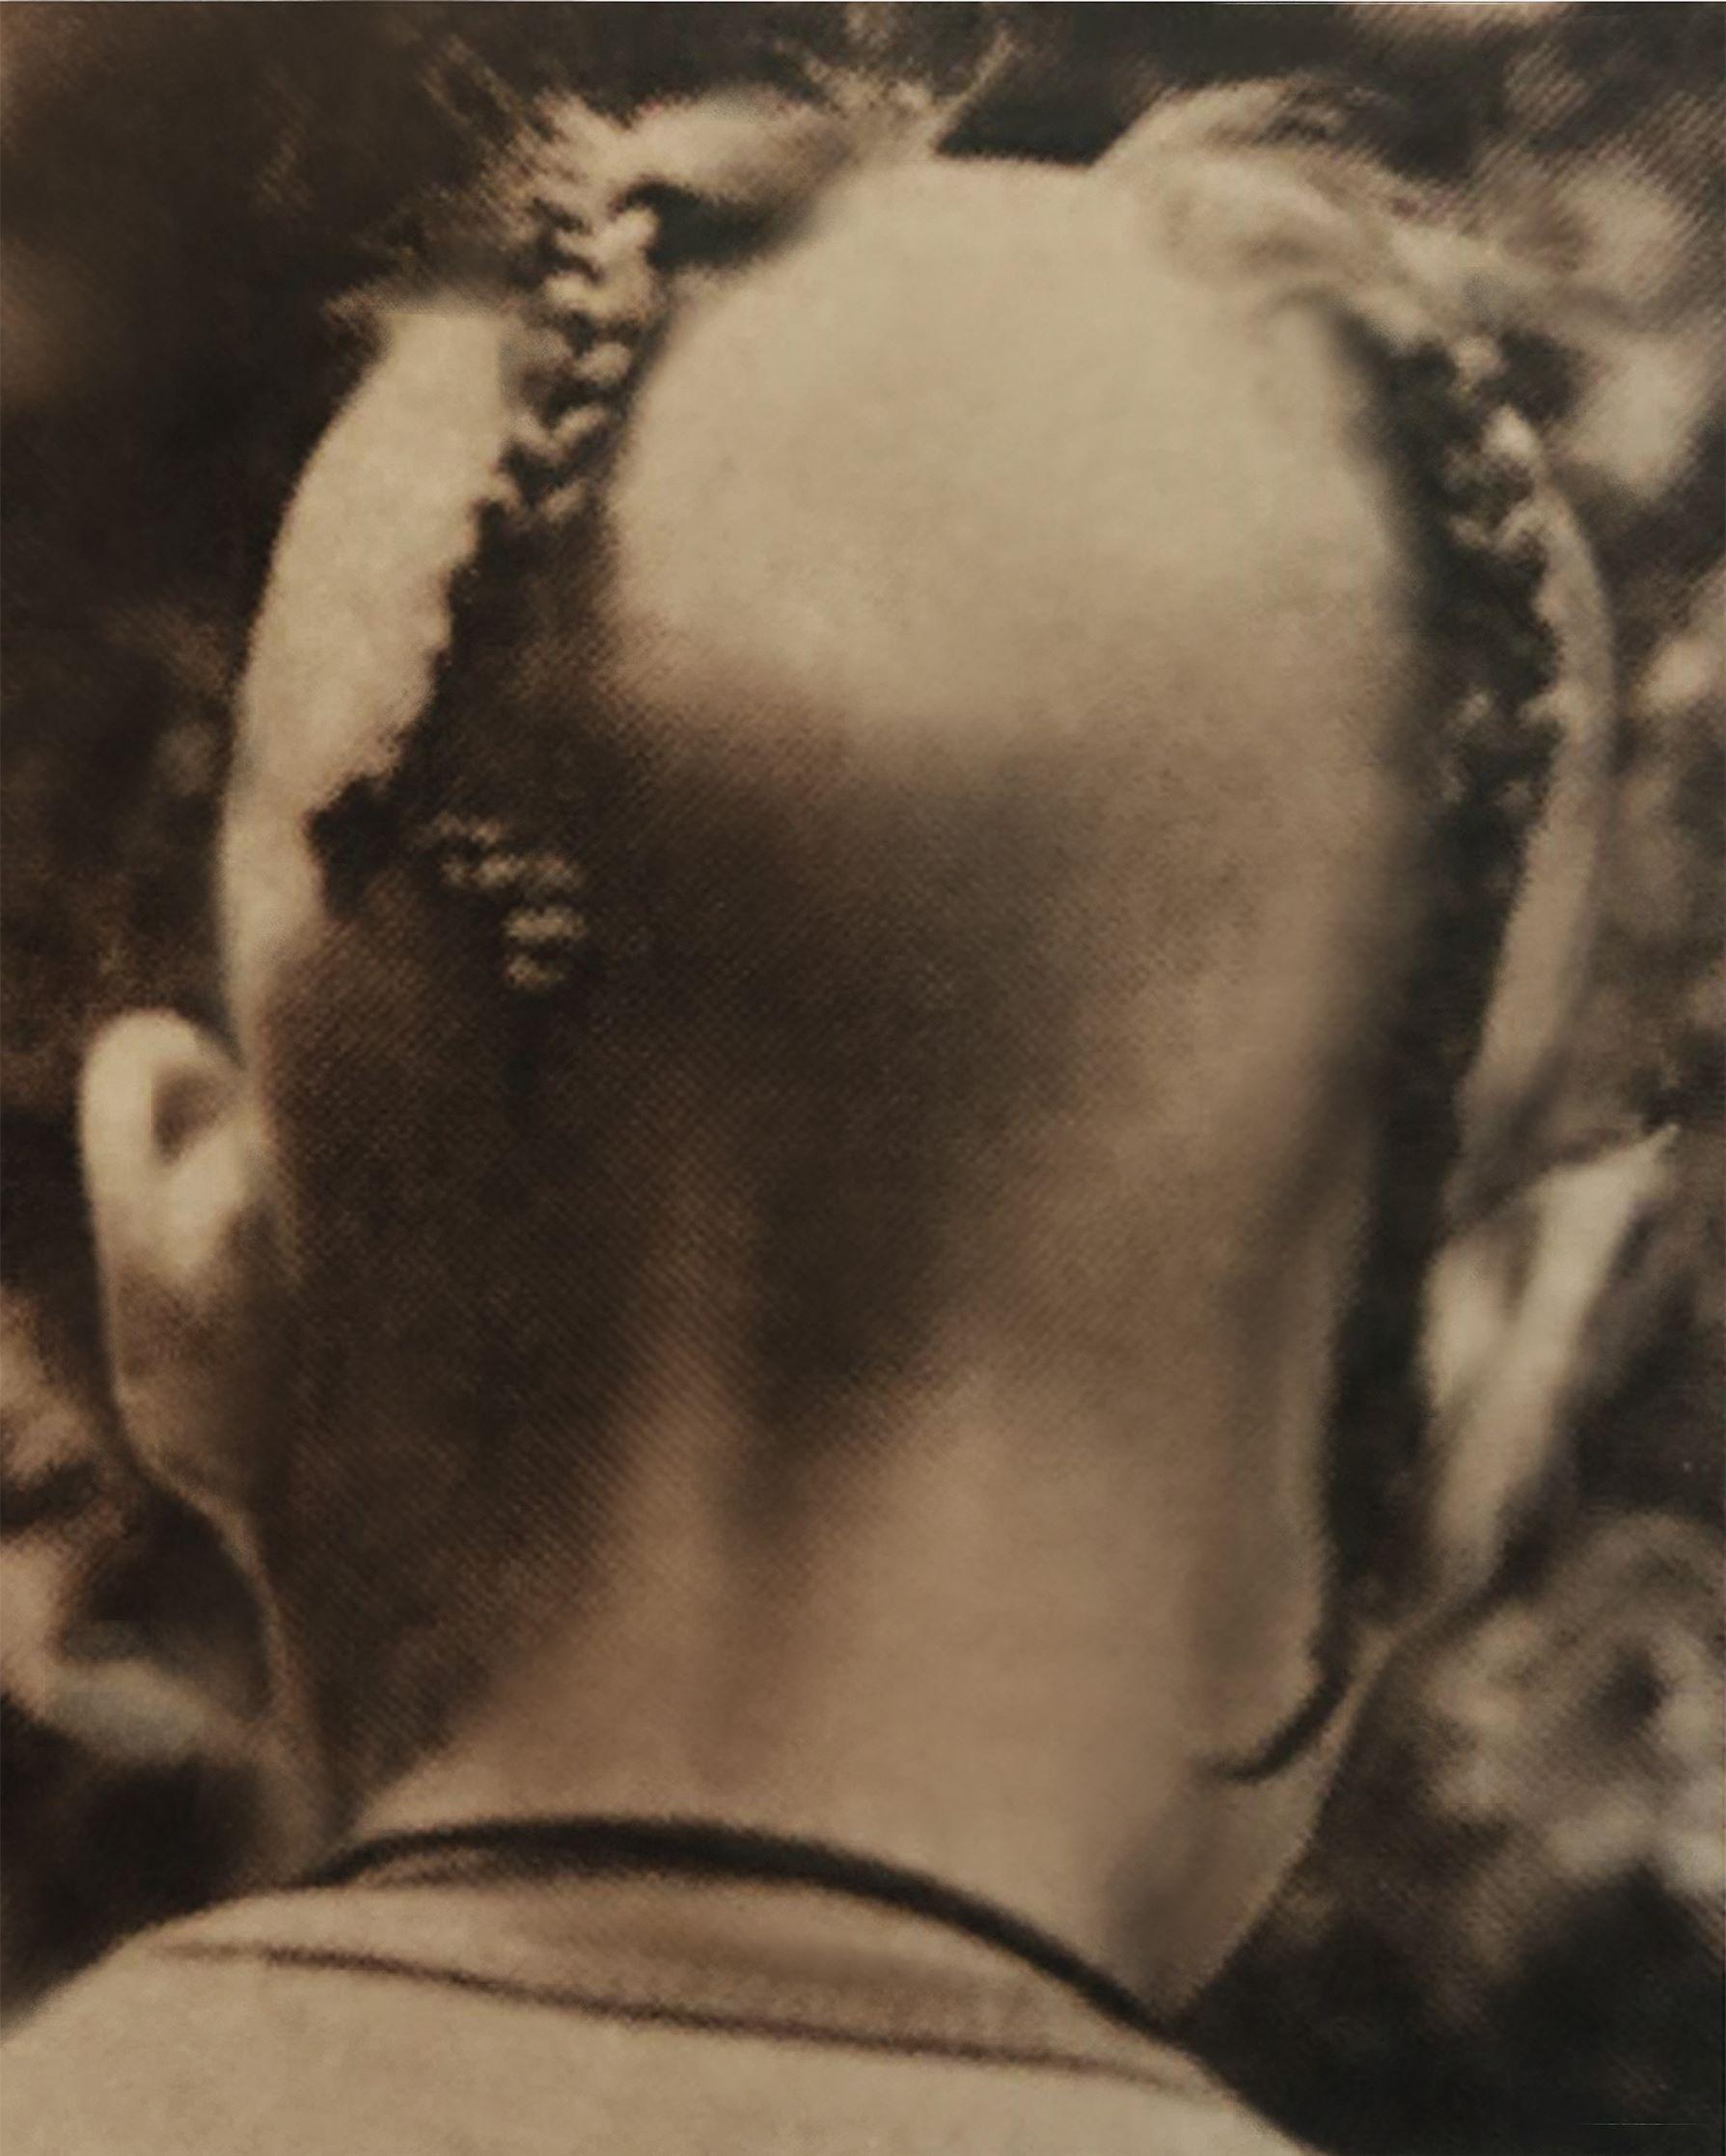 Thai Style Studio 1984 ทรงผมเด็กไทยในสมัยโบราณ / ความเชื่อกับทรงผม 7